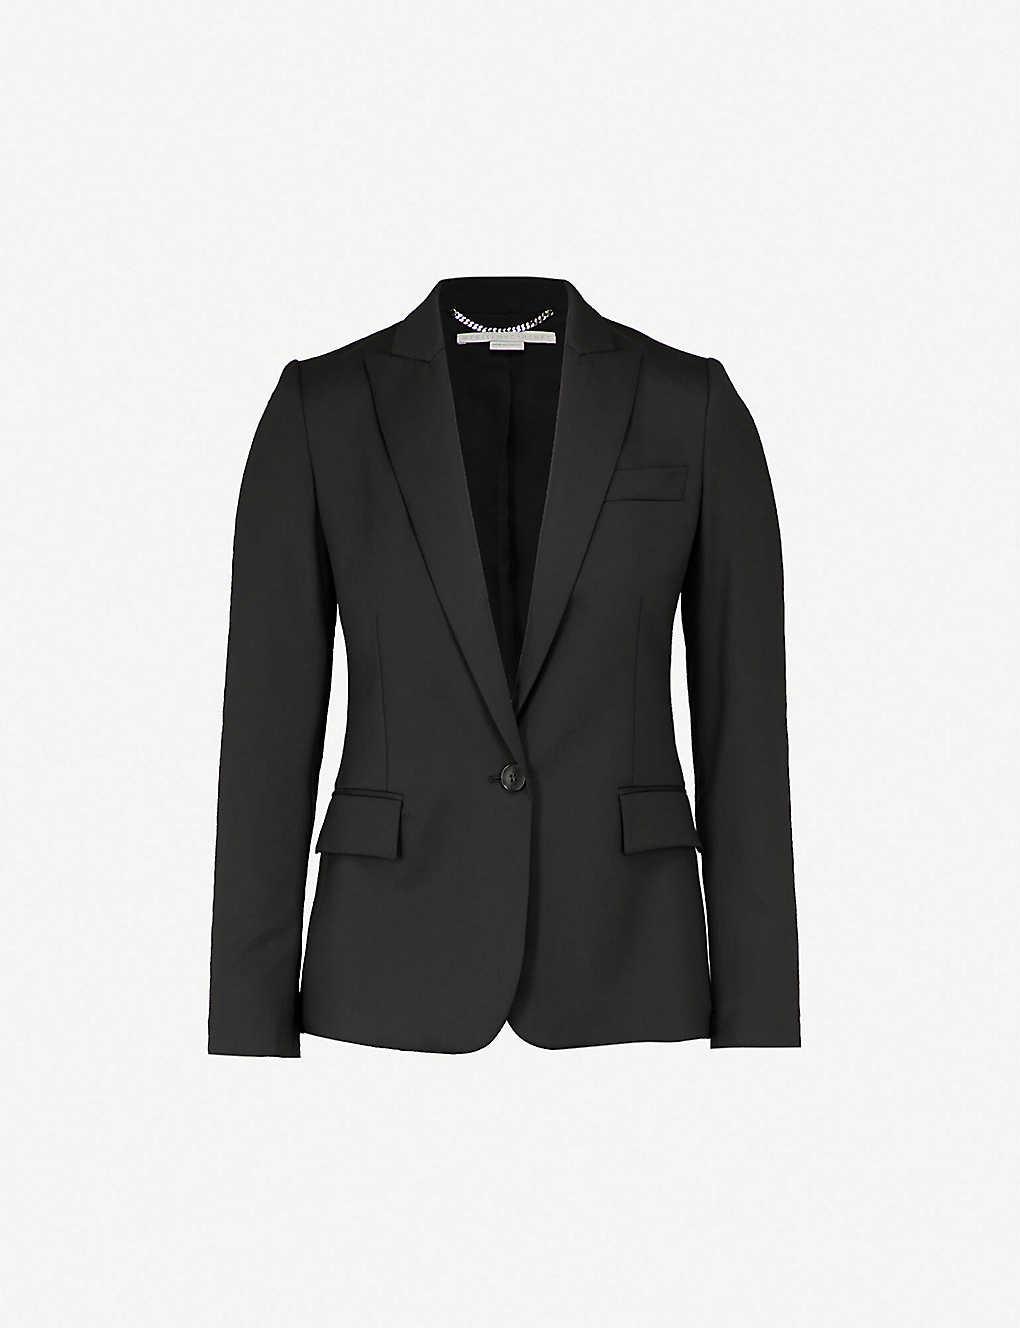 Stella Mccartney Coats Ingrid single-breasted wool jacket